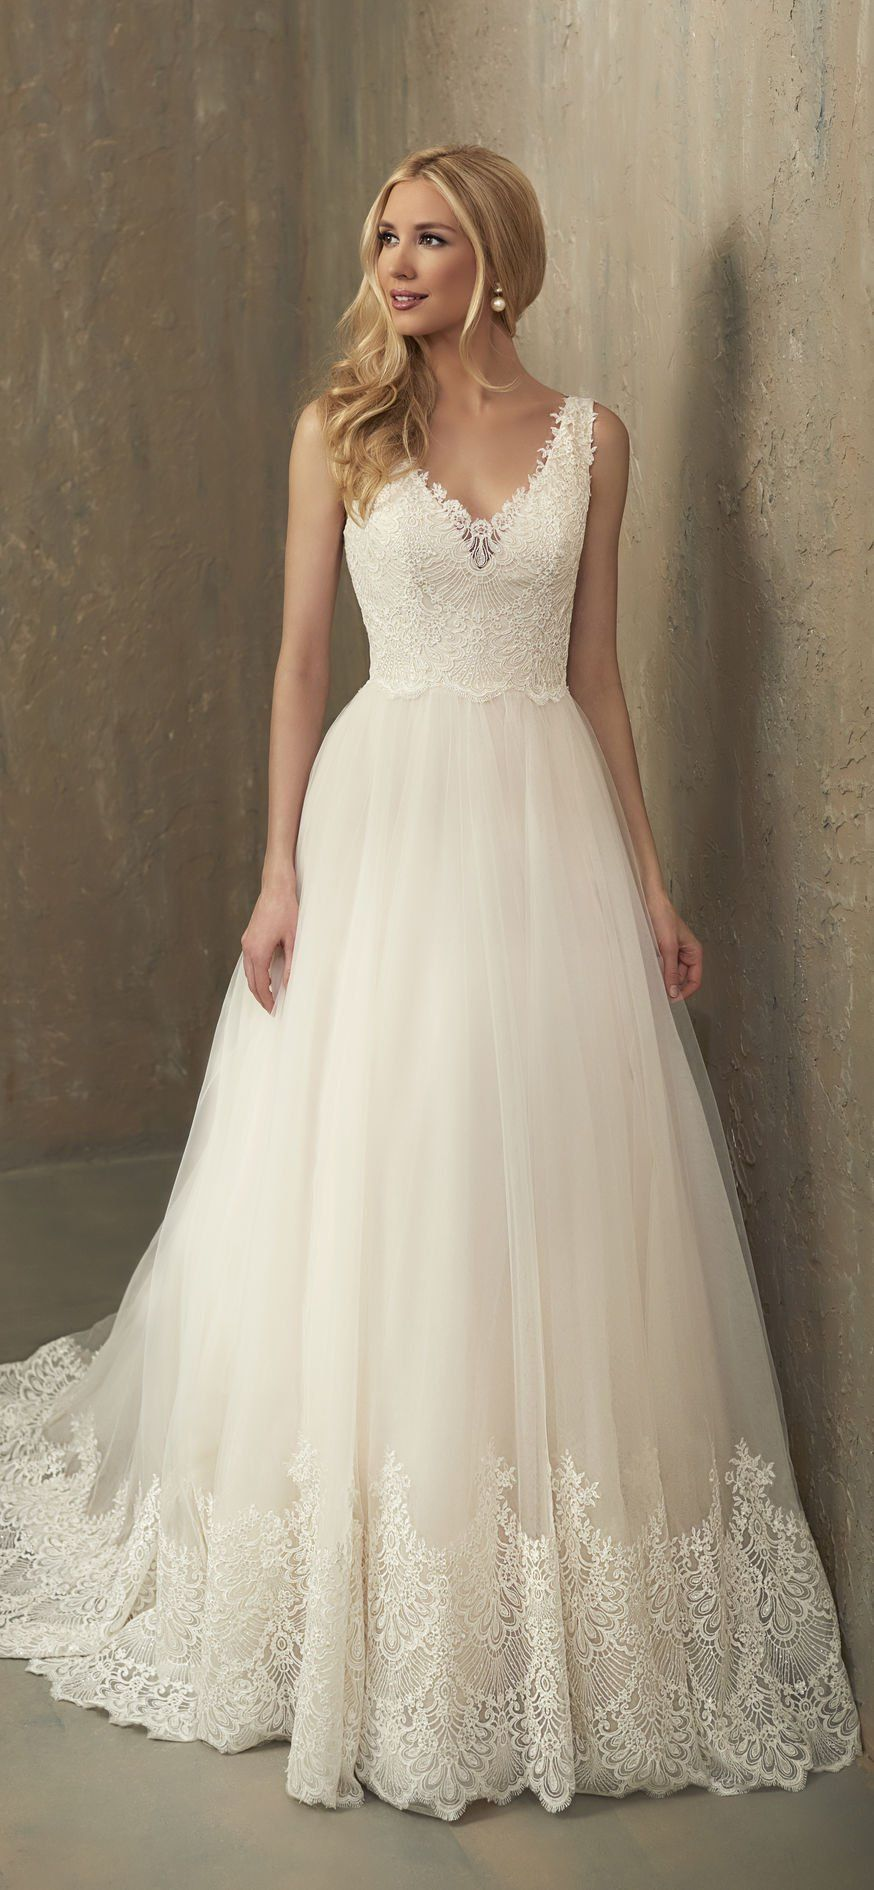 Paisley Adrianna papell wedding dress, Paisley wedding